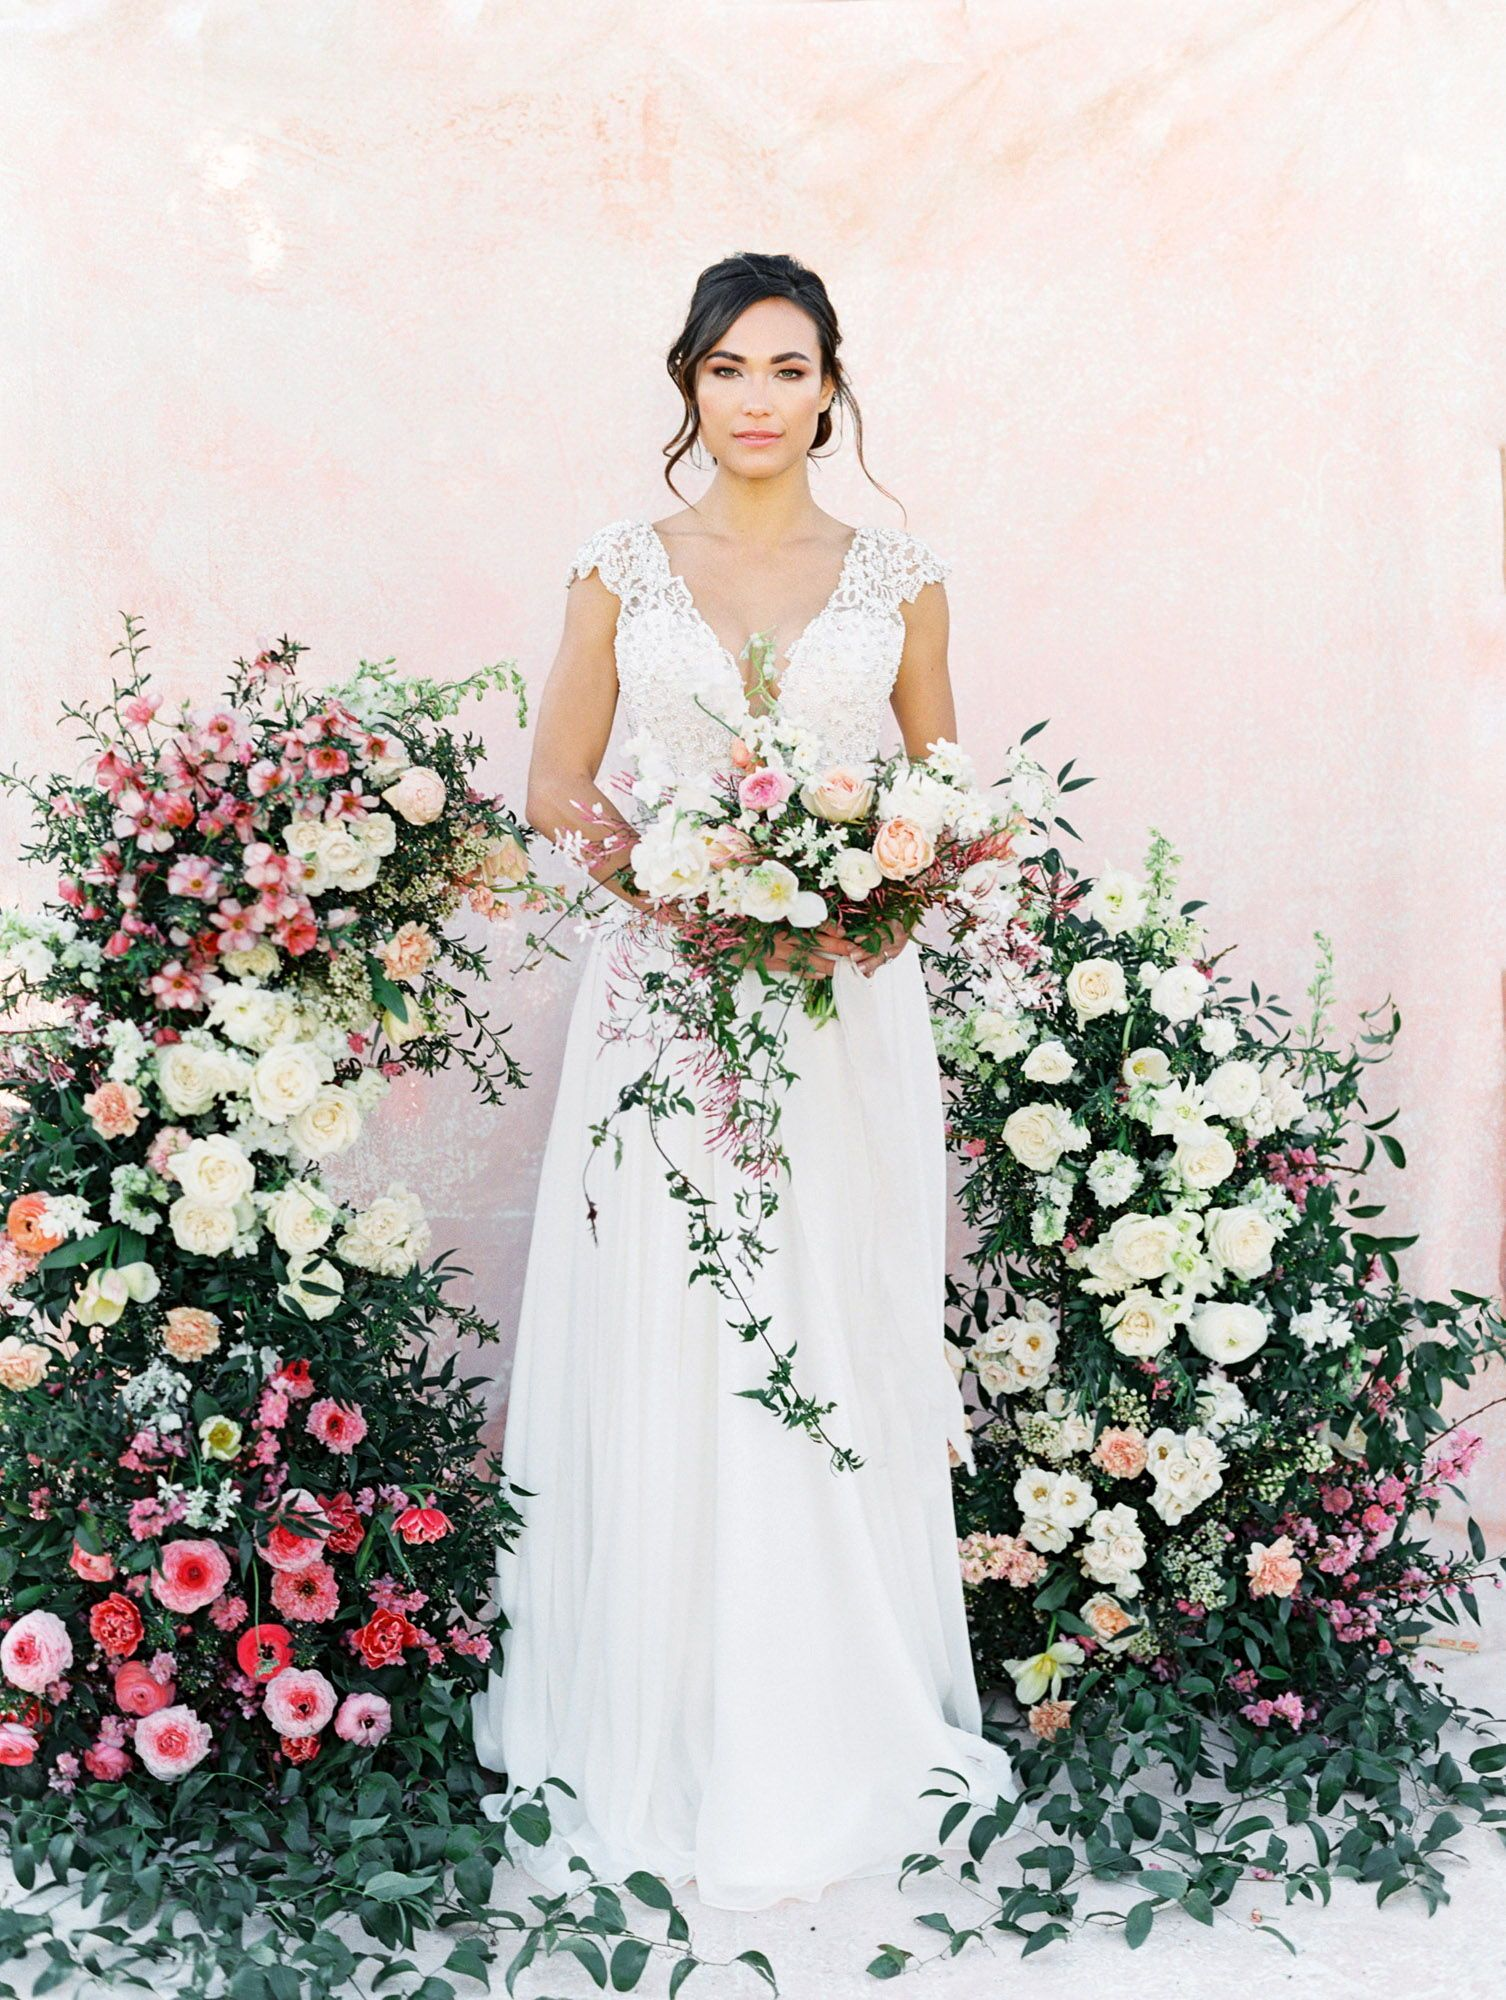 Hayley Paige Wedding Dresses In San Diego In 2020 Wedding Dress Silhouette Hayley Paige Wedding Dress Hayley Paige Wedding